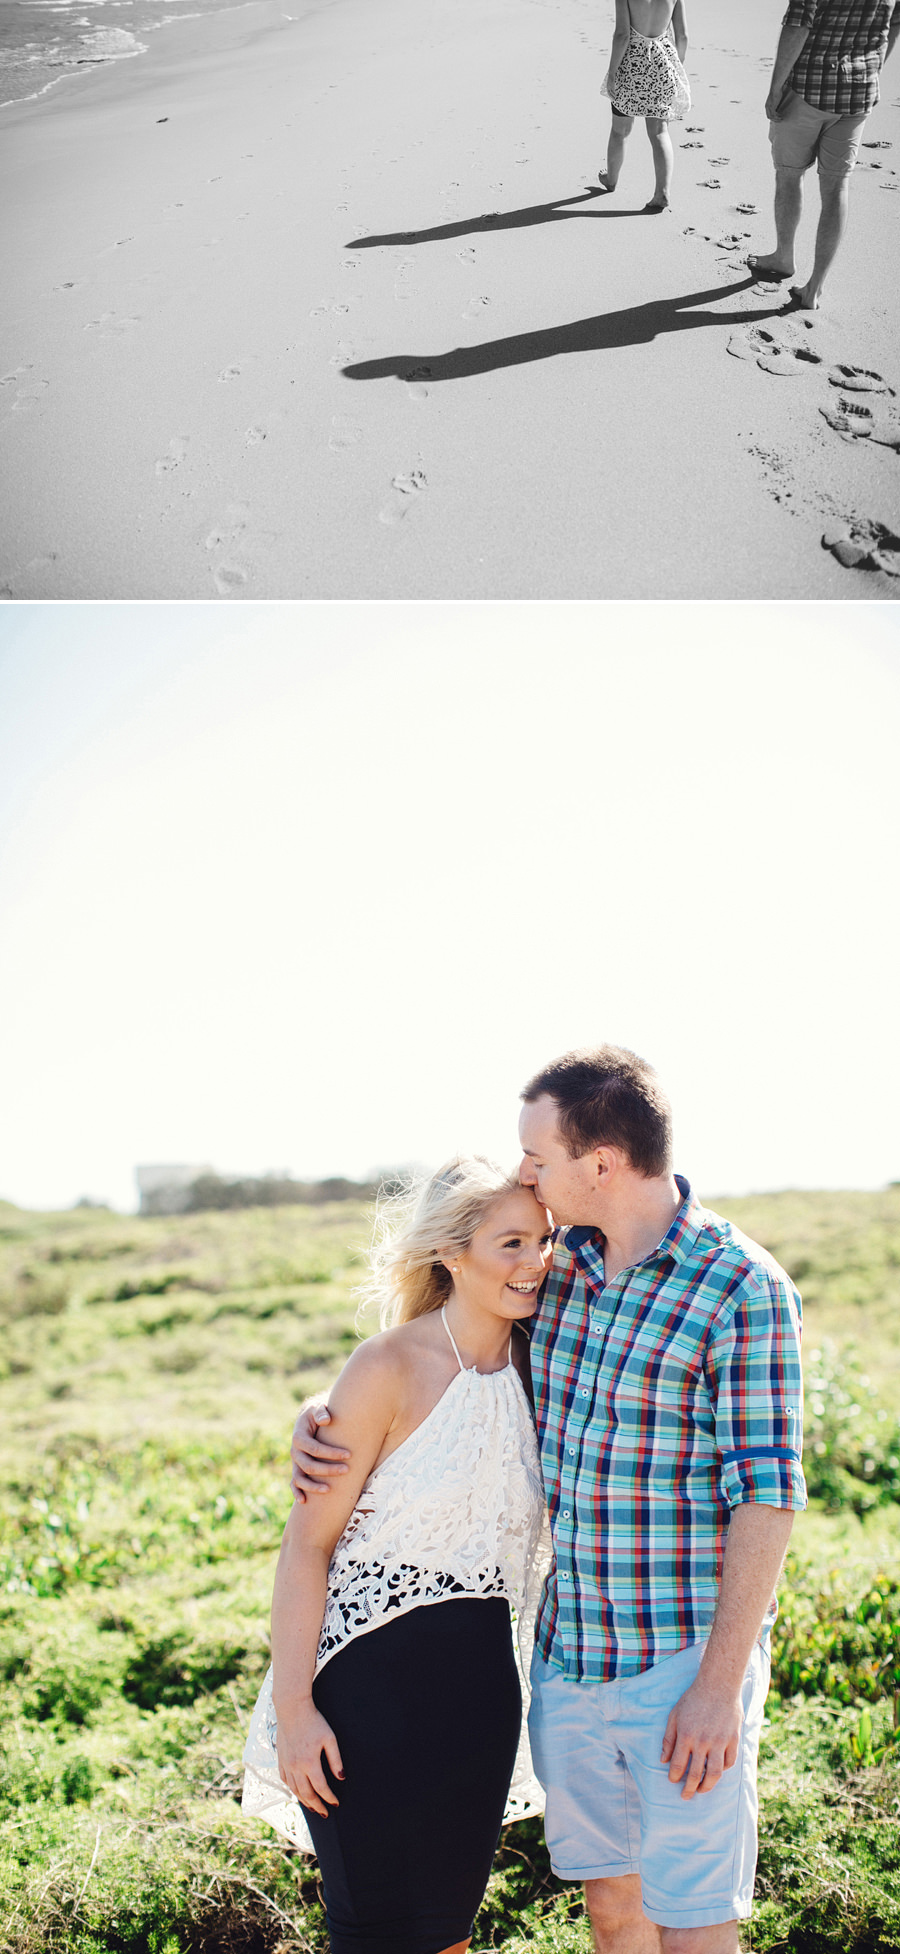 Sydney Engagement Photographer: Sara & Sam